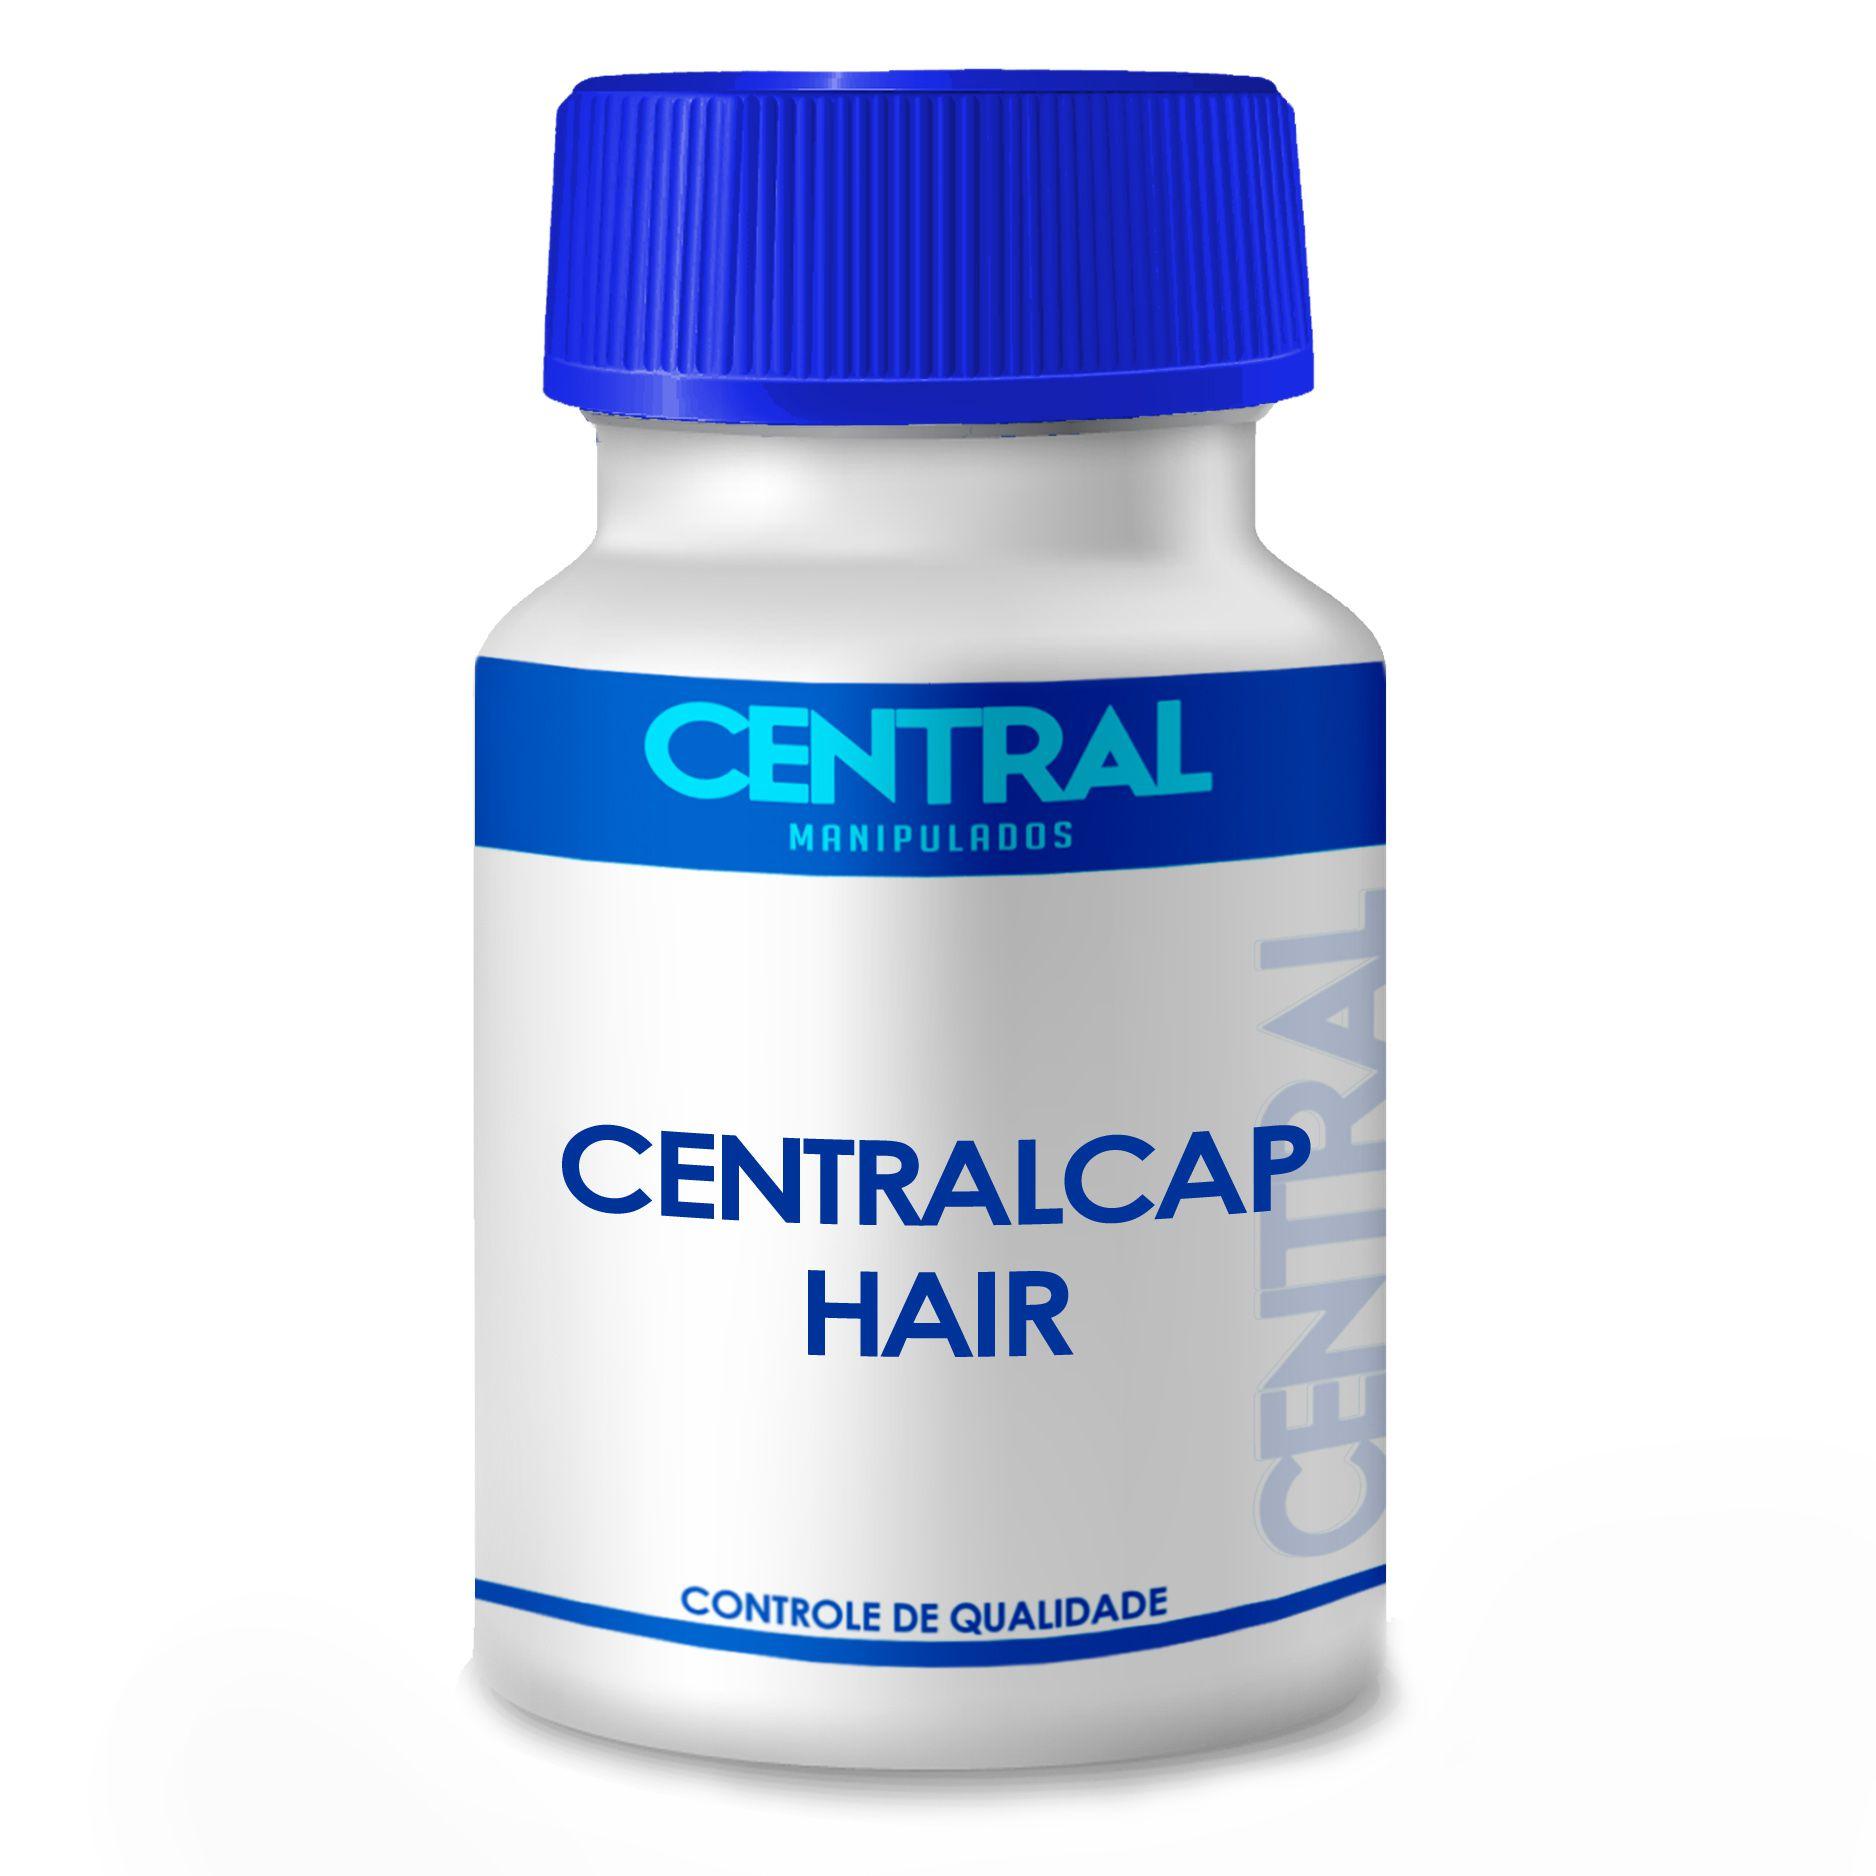 CentralCap Hair